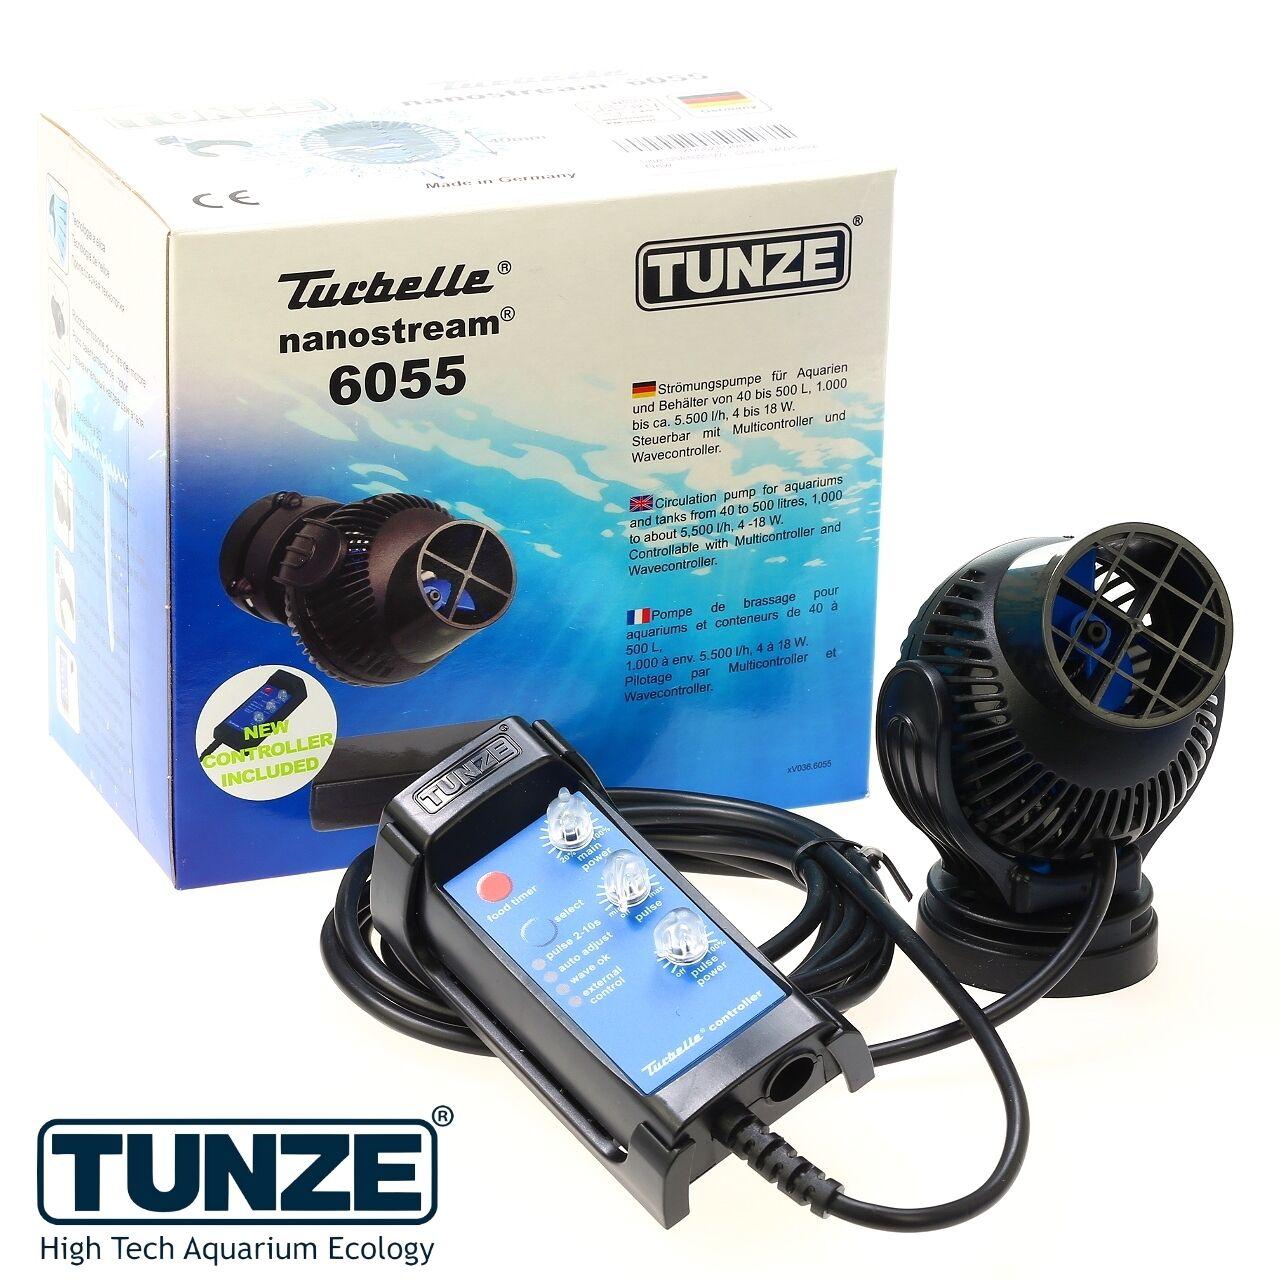 Tunze Turbelle NanoStream 6055 Controllable Pump w  Controller Electronic